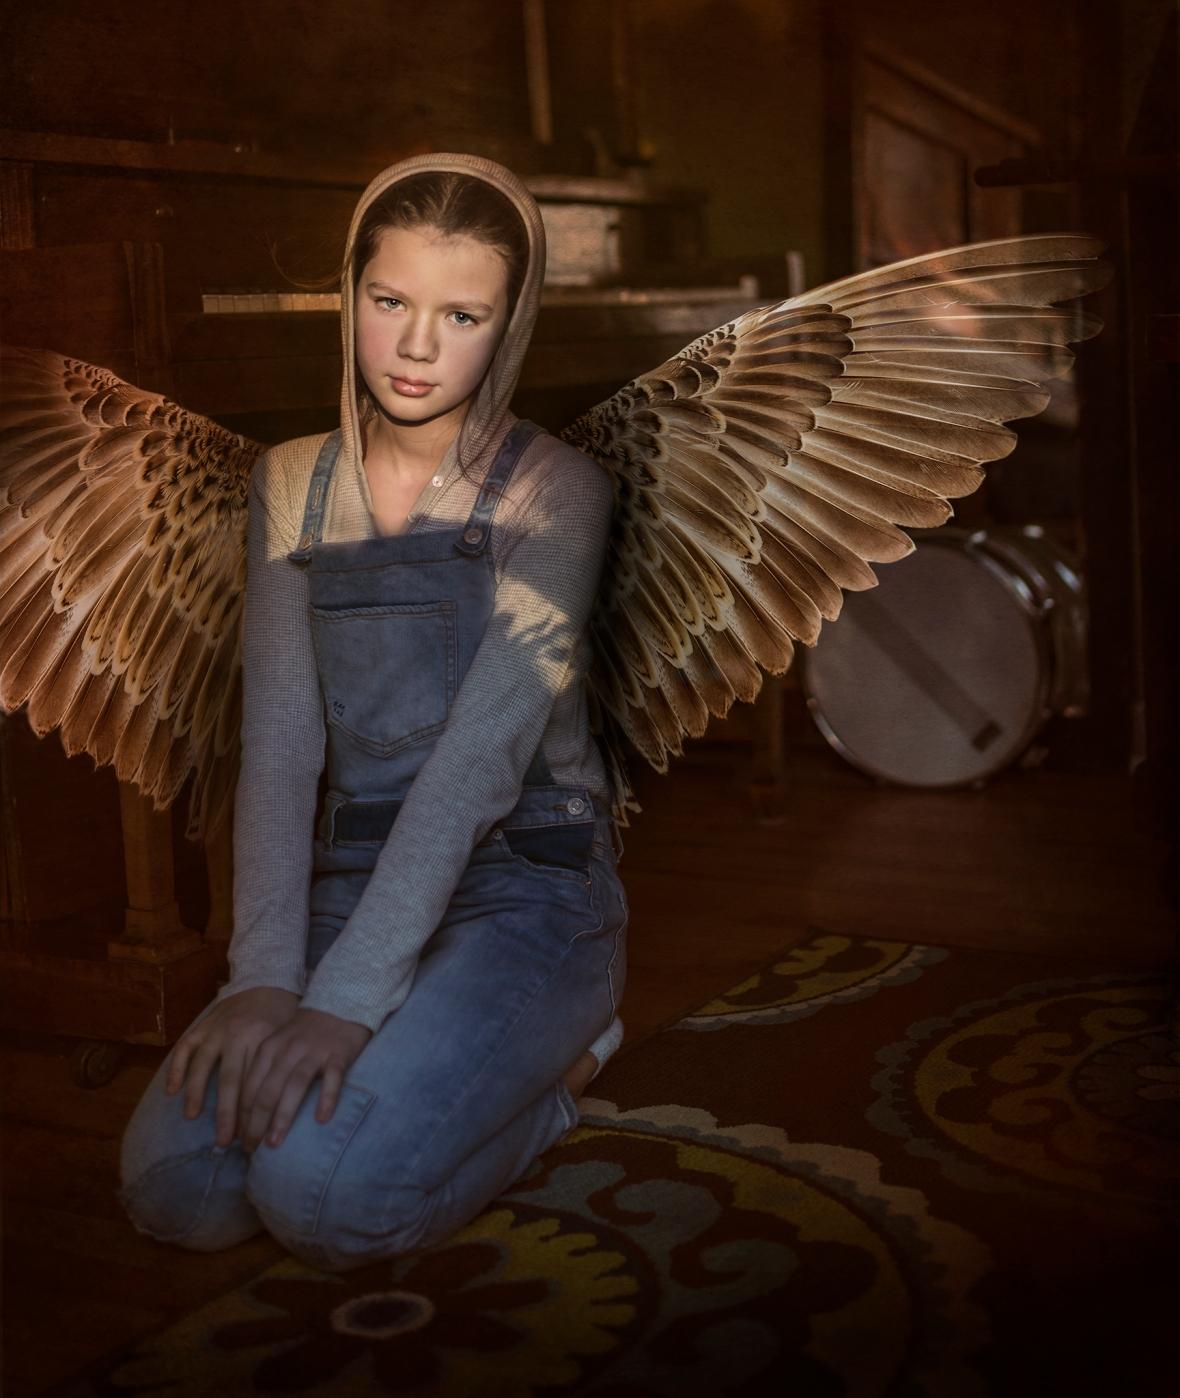 Winged child